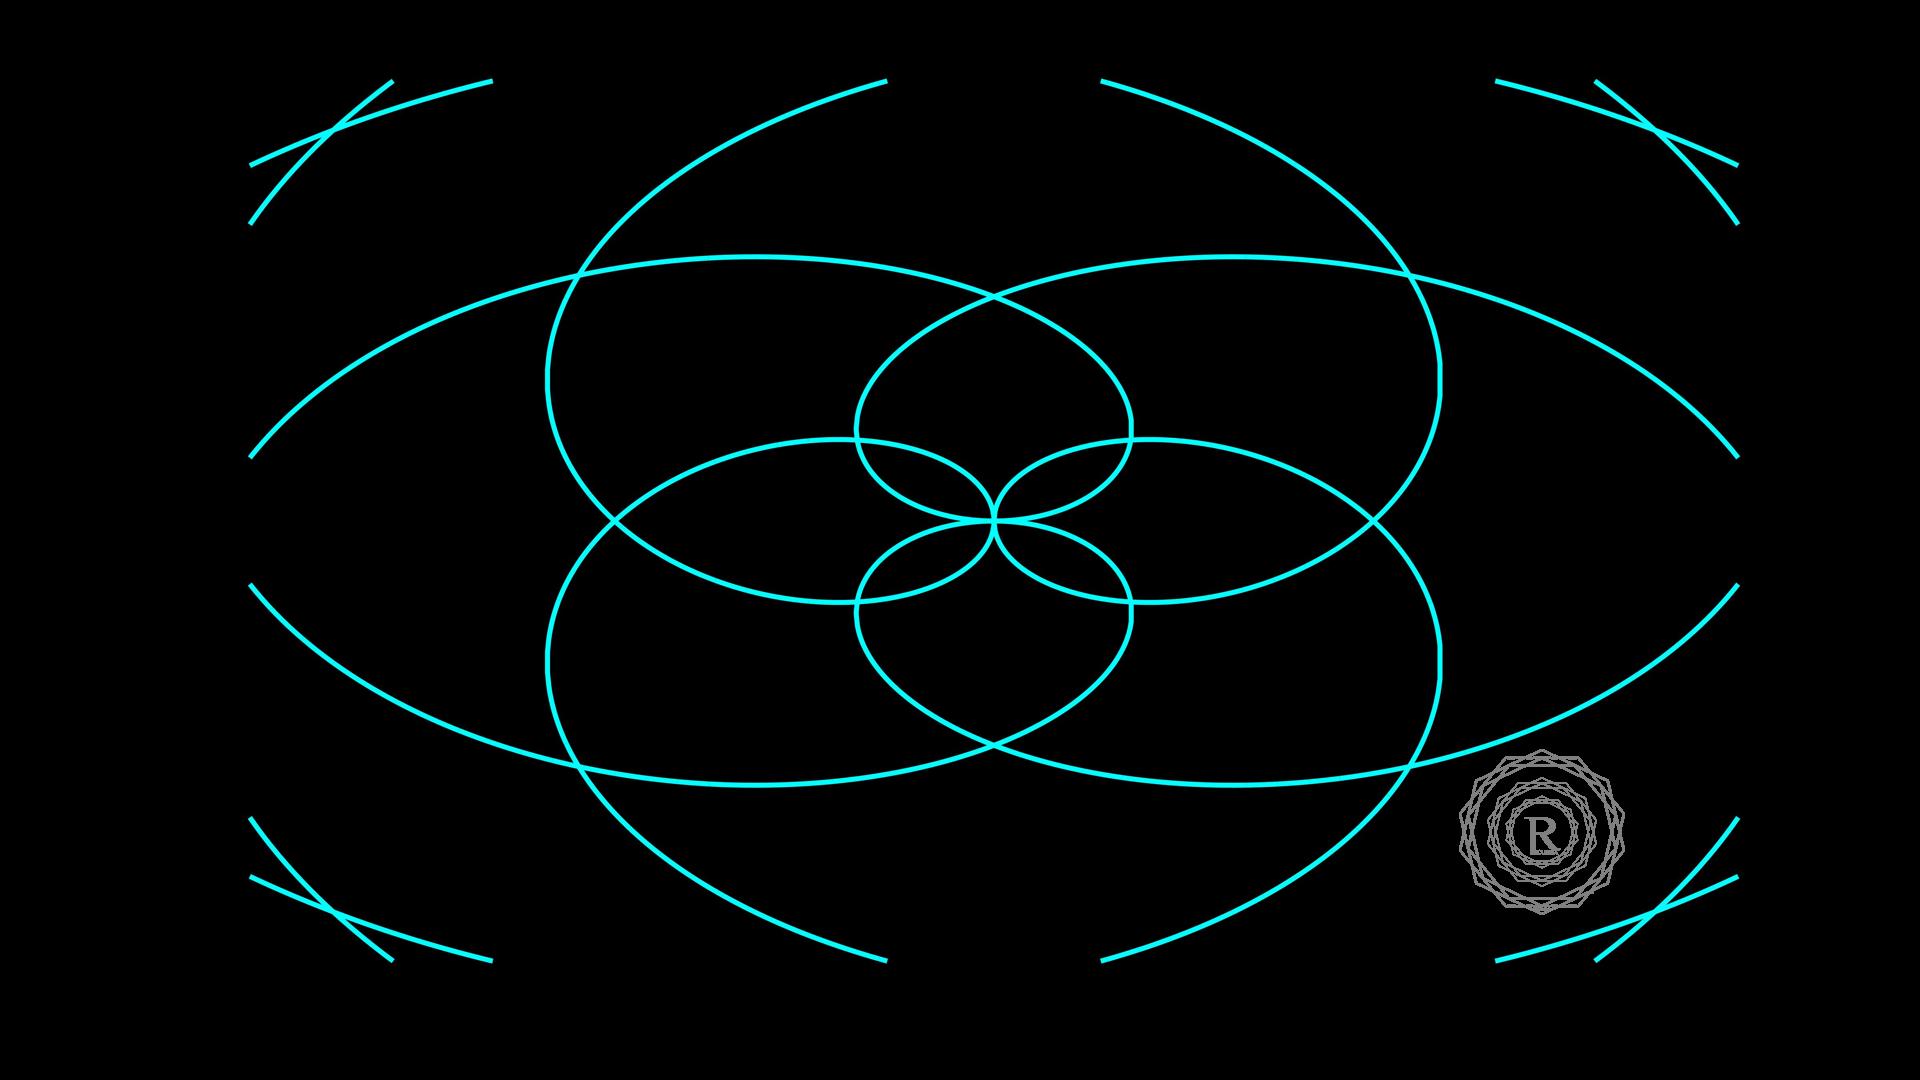 00034Resized_Geometry_copyright_Recursia